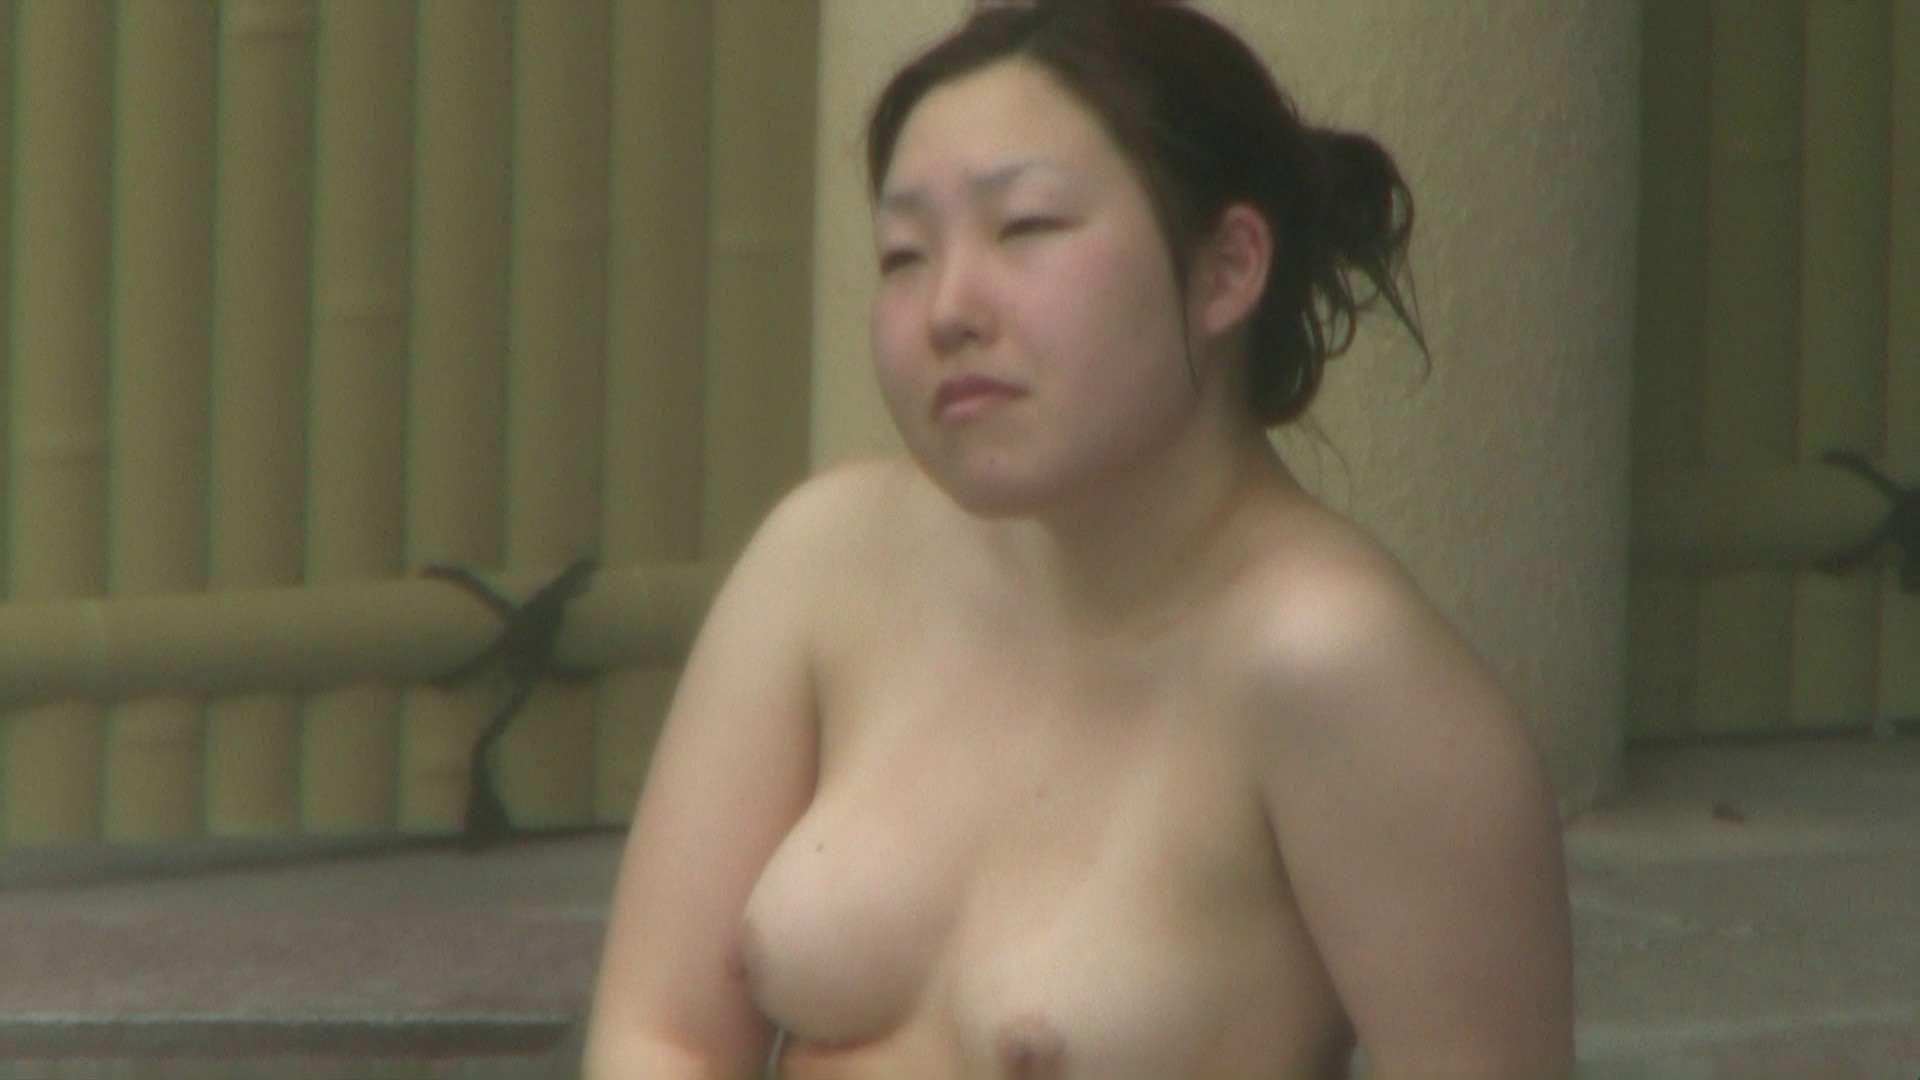 Aquaな露天風呂Vol.72【VIP限定】 露天風呂編 | 盗撮シリーズ  98PIX 91